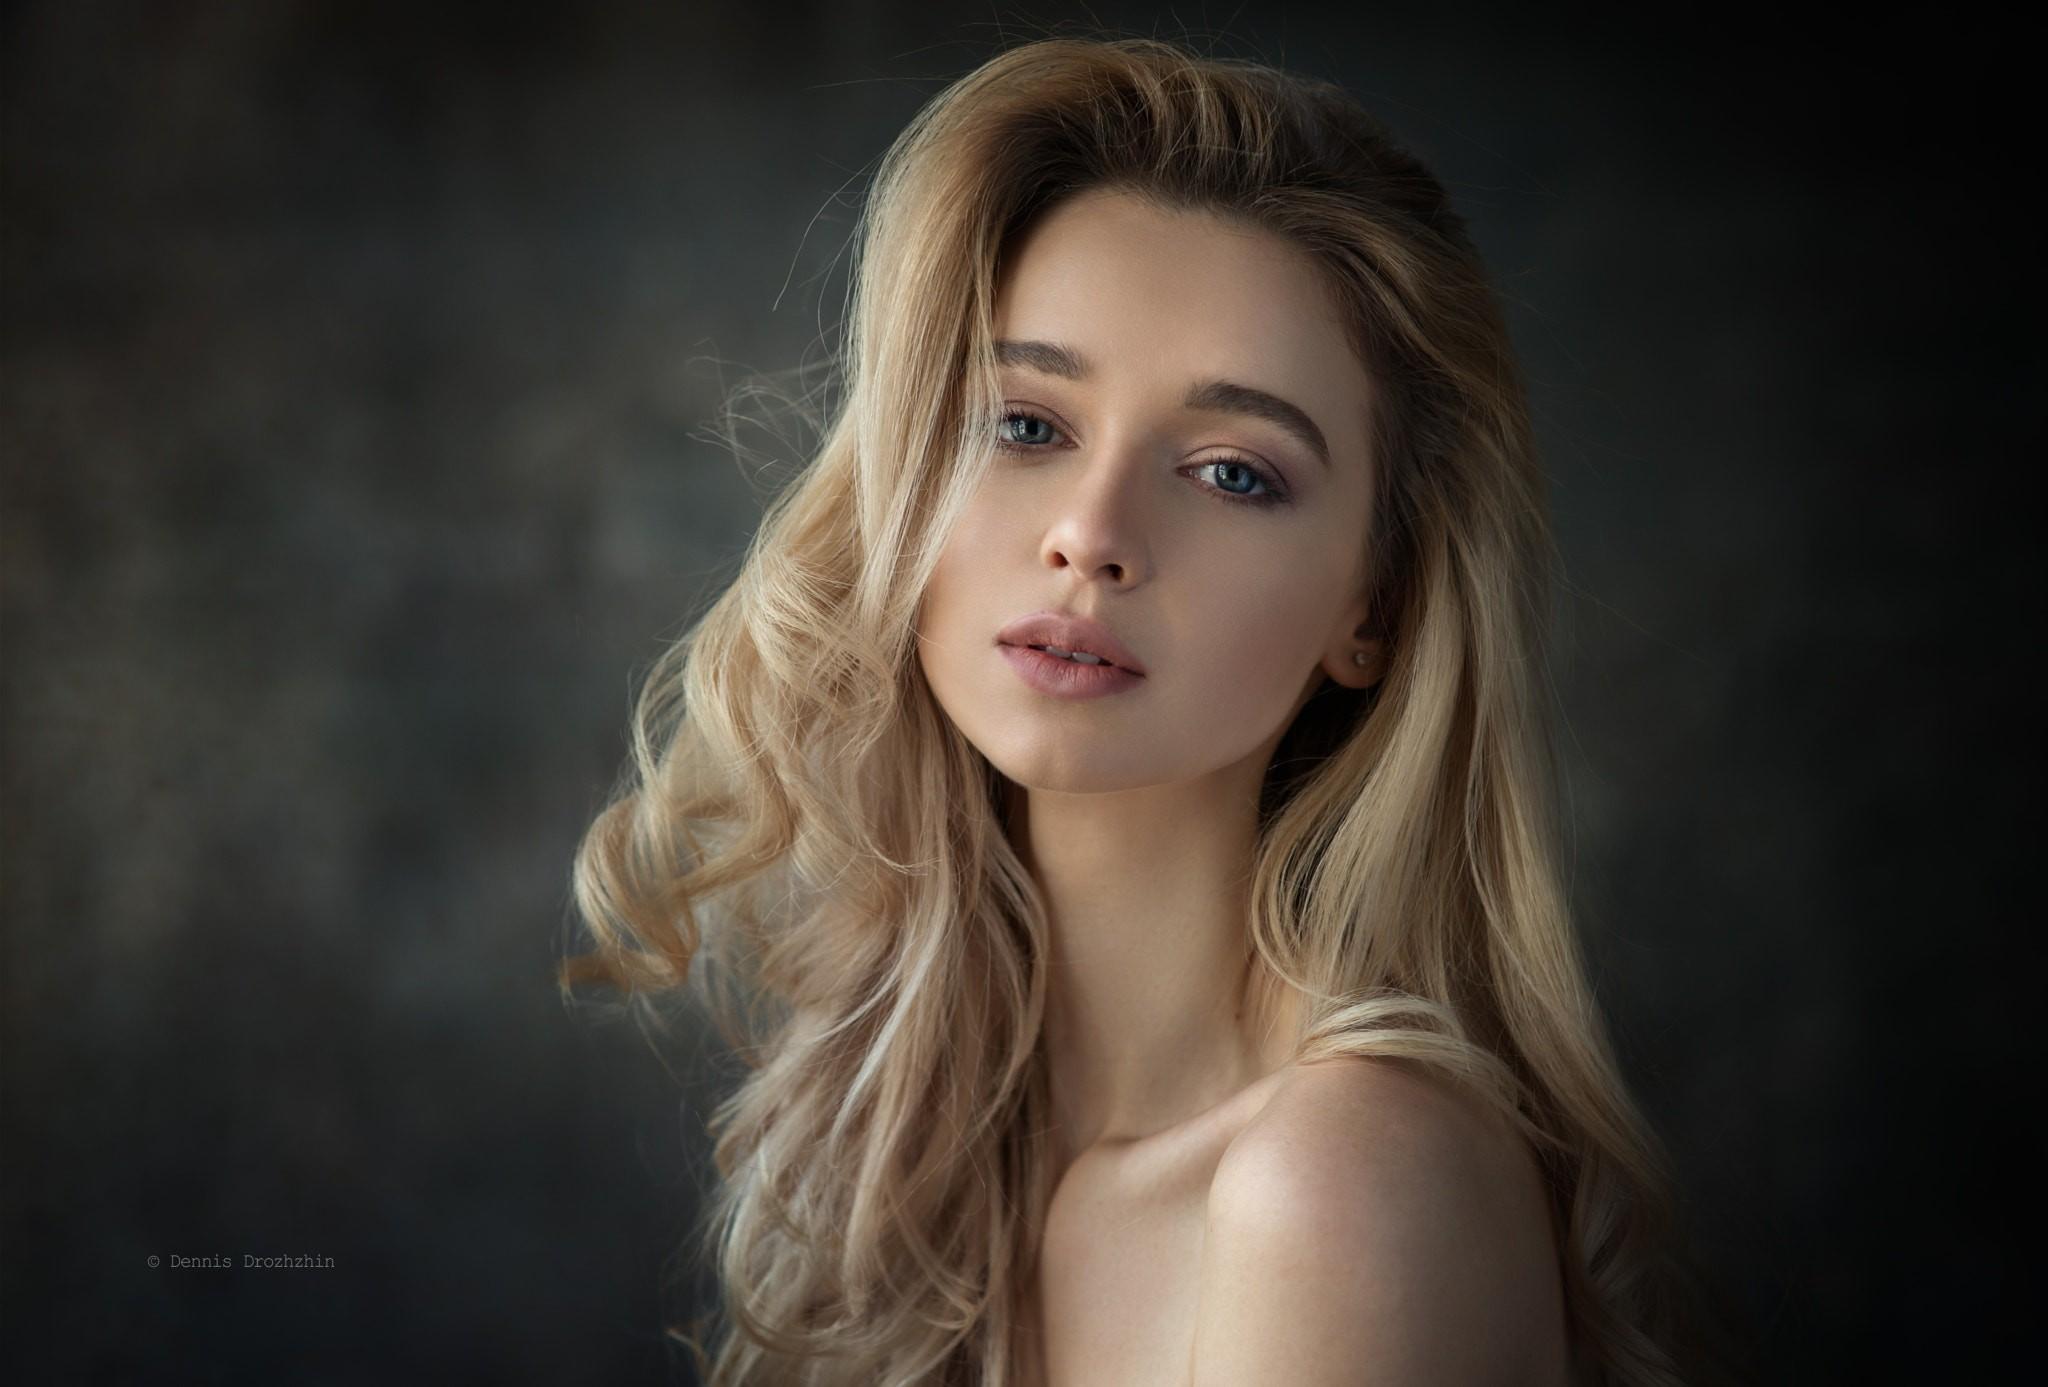 Wallpaper Face Model Blonde Long Hair Blue Eyes: Wallpaper : Women, Model, Blonde, Simple Background, Long